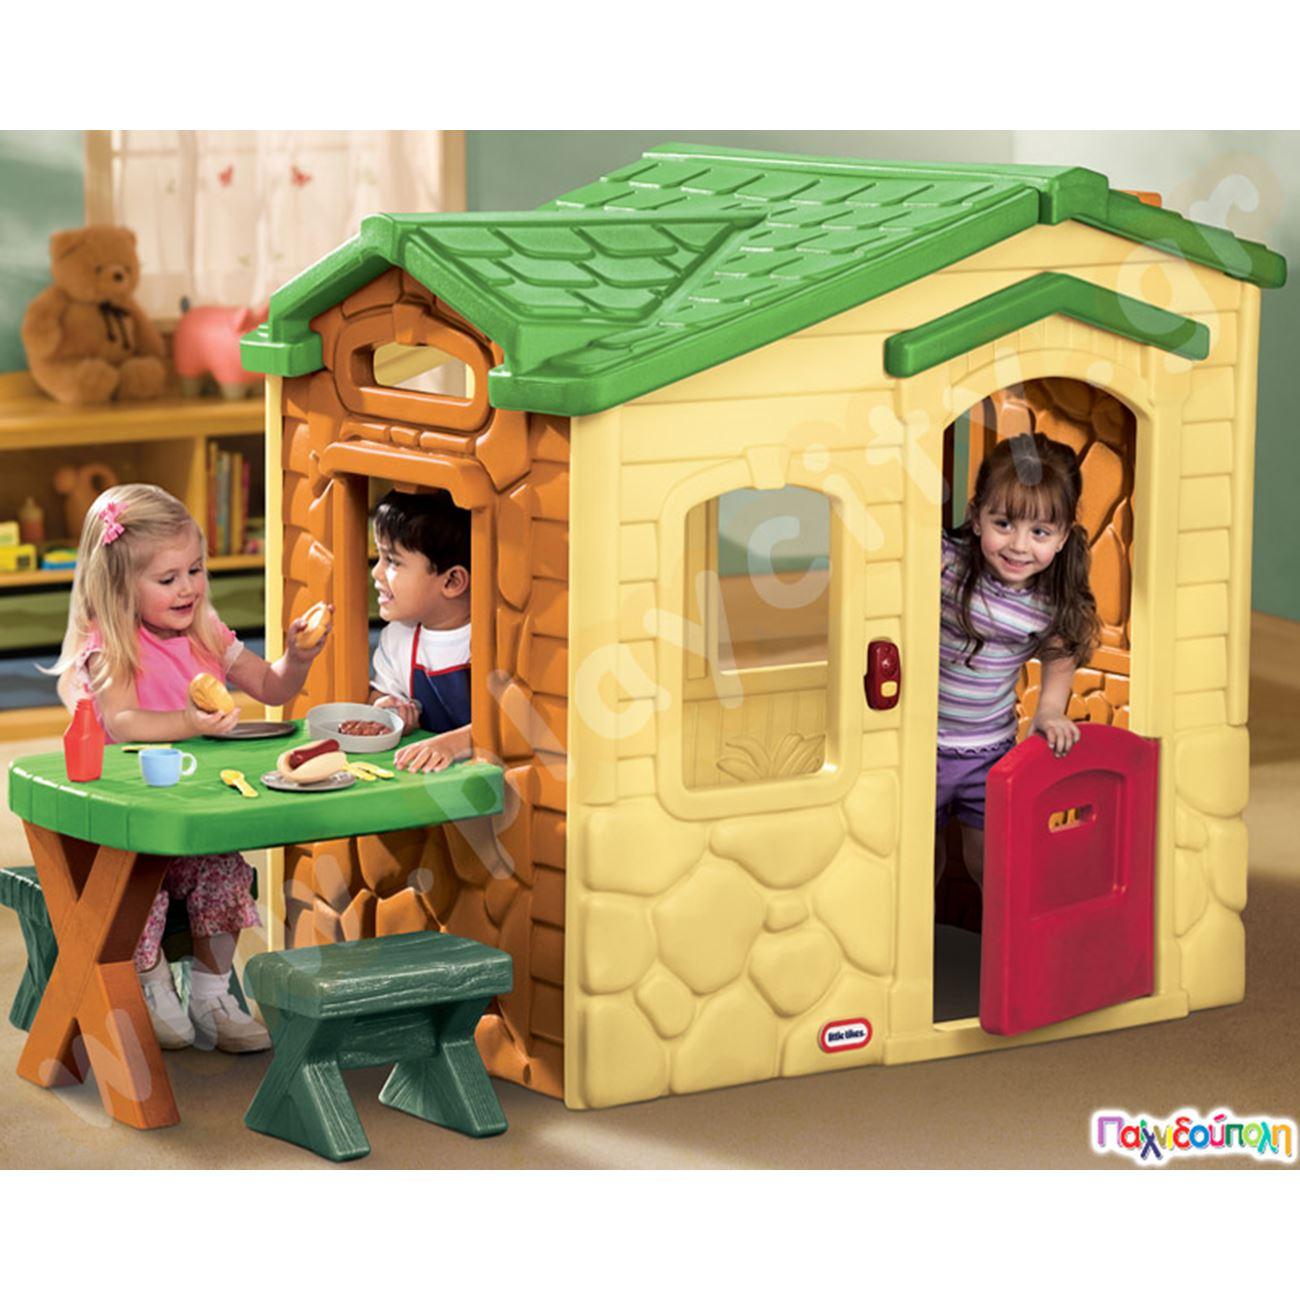 674aeba570d7 Παιχνίδια Εξωτερικού Χώρου και Μίμησης Little Tikes Πλαστικό παιδικό ...